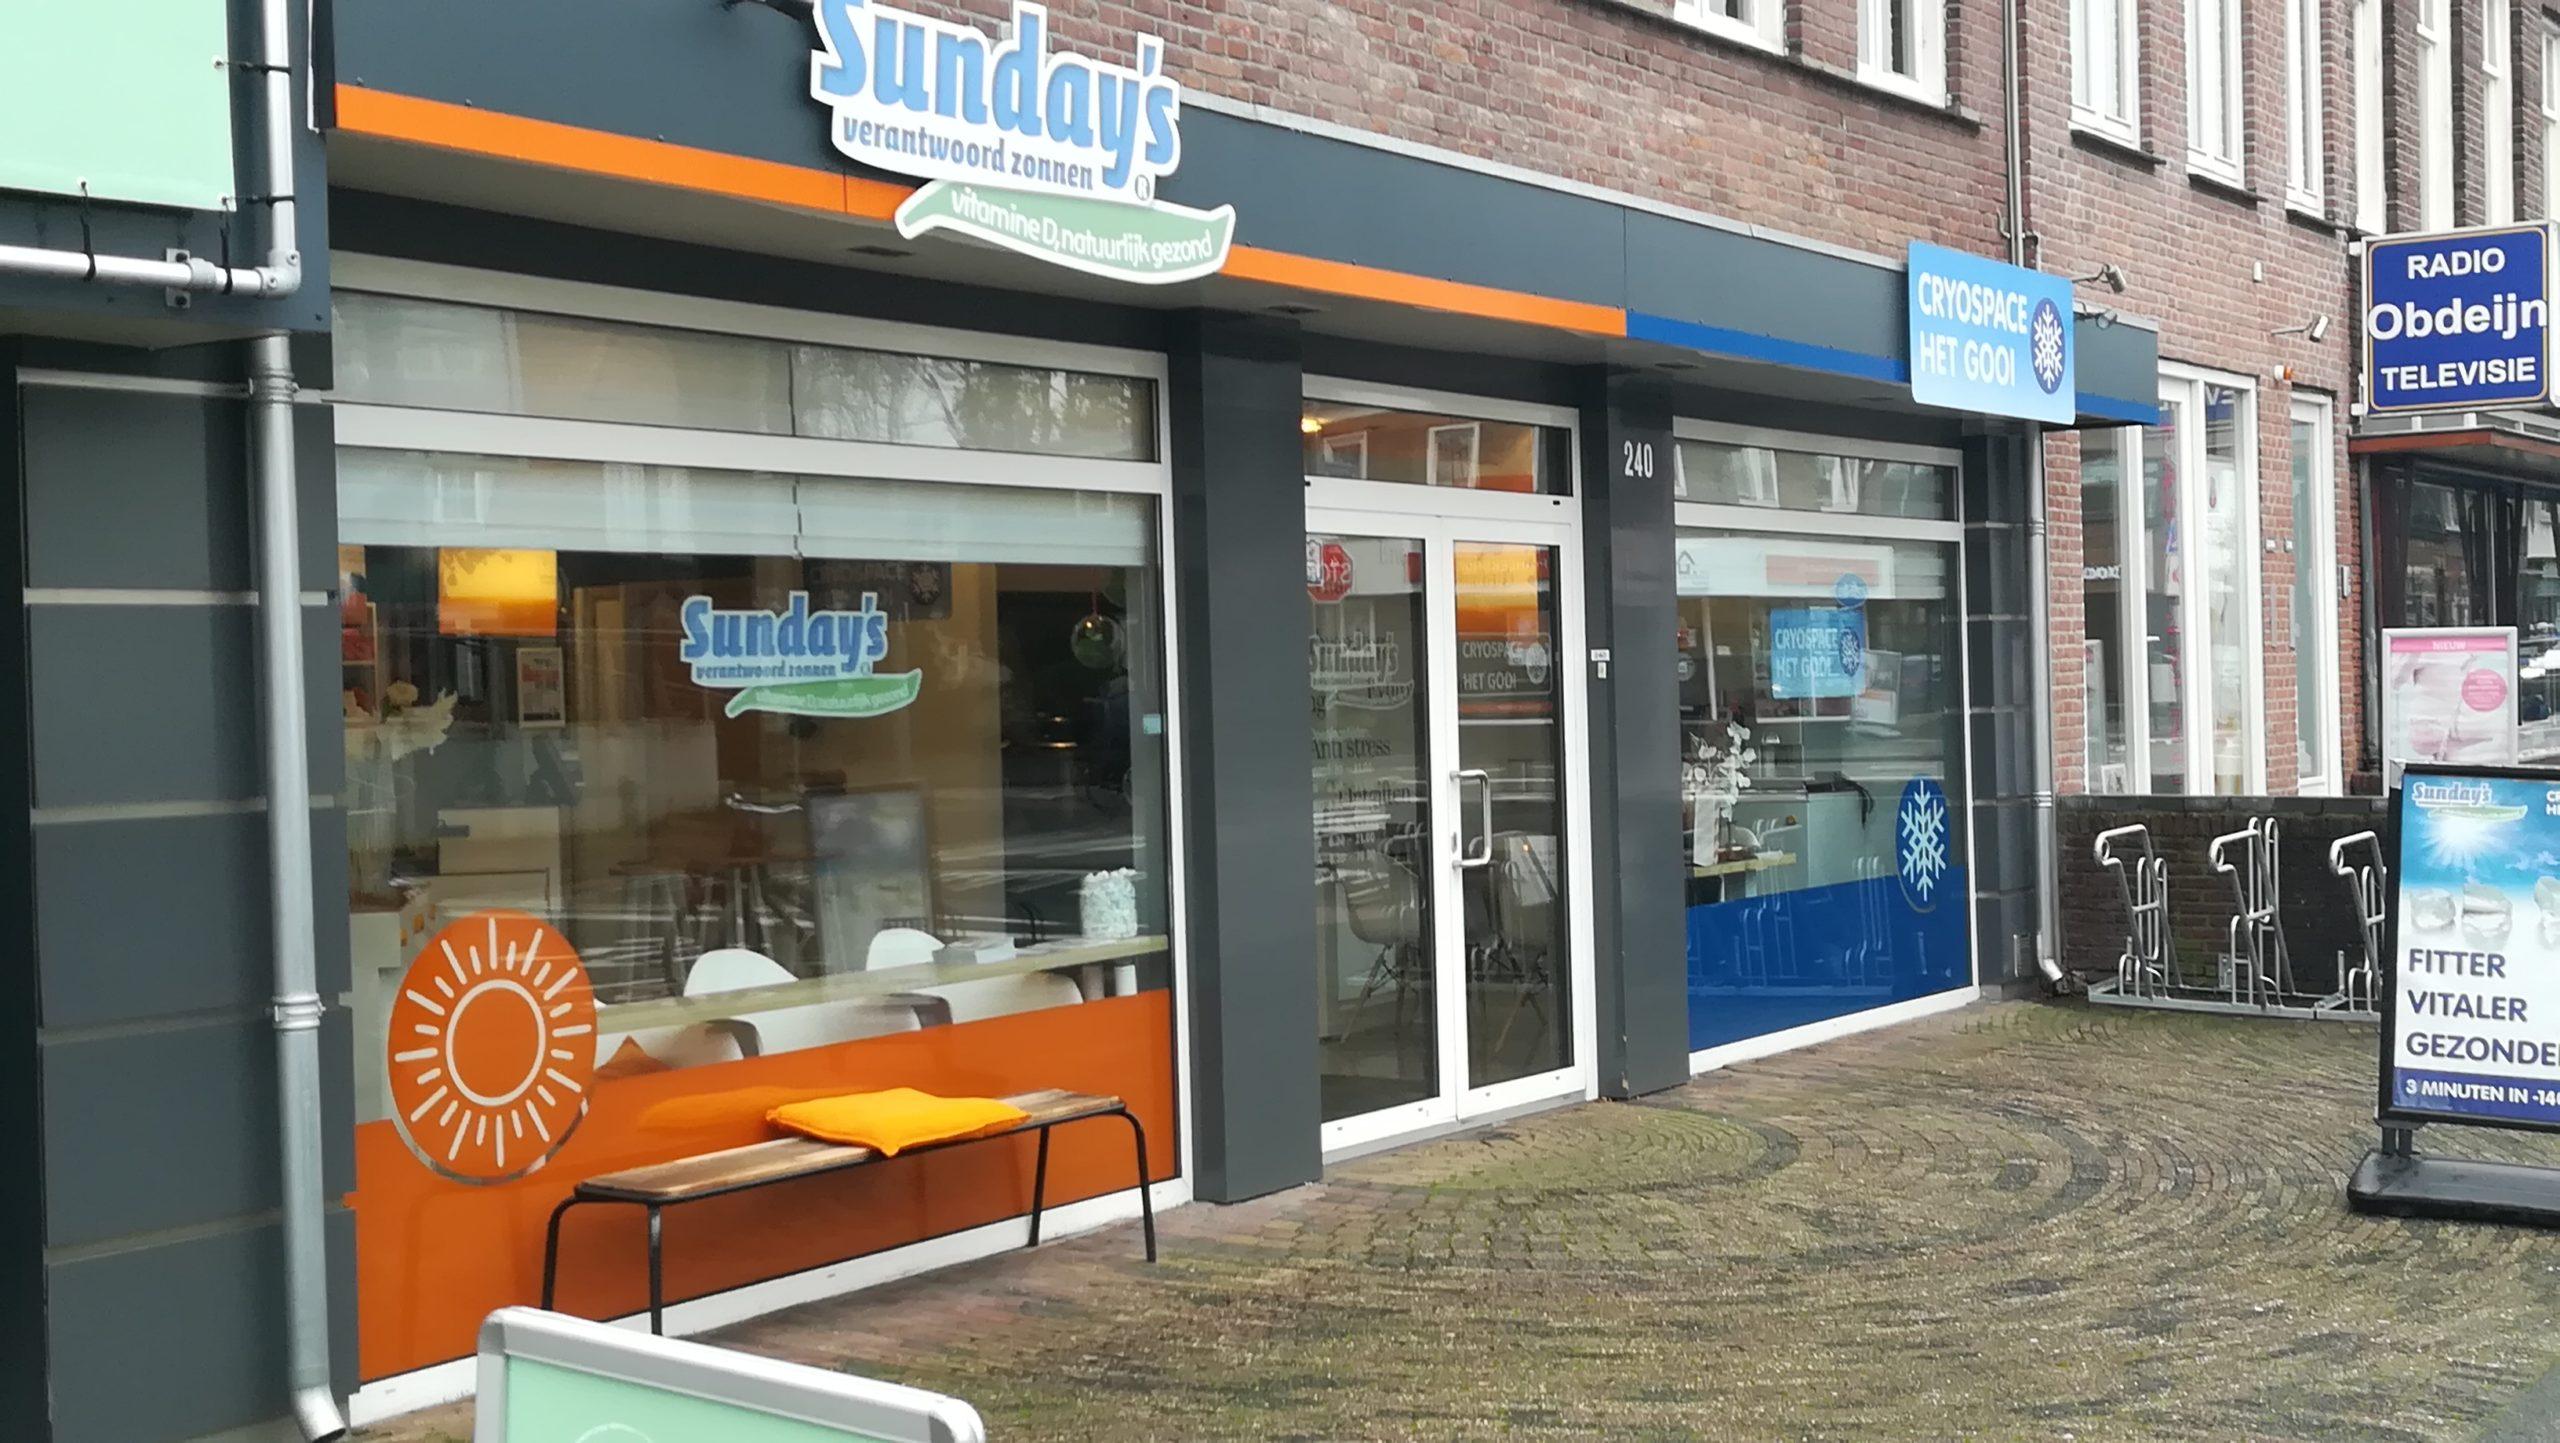 Sunday's Hilversum